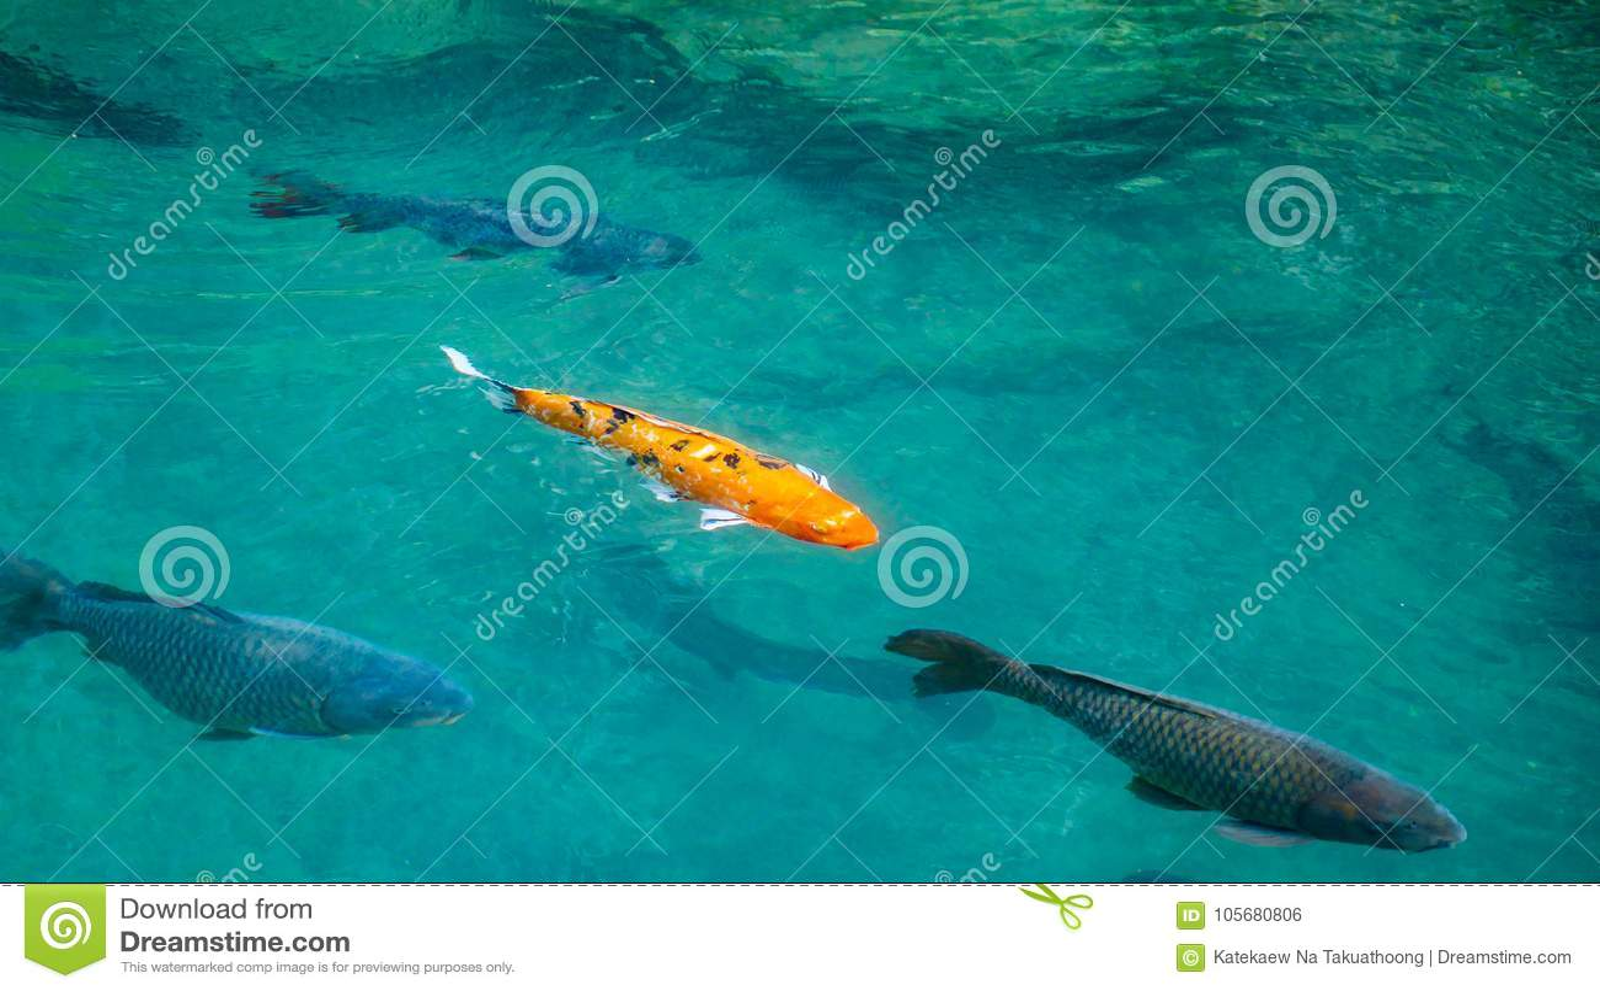 Twilight In Koi Pond >> Colorful Orange Black And White Carp Fish Stock Photo Image Of